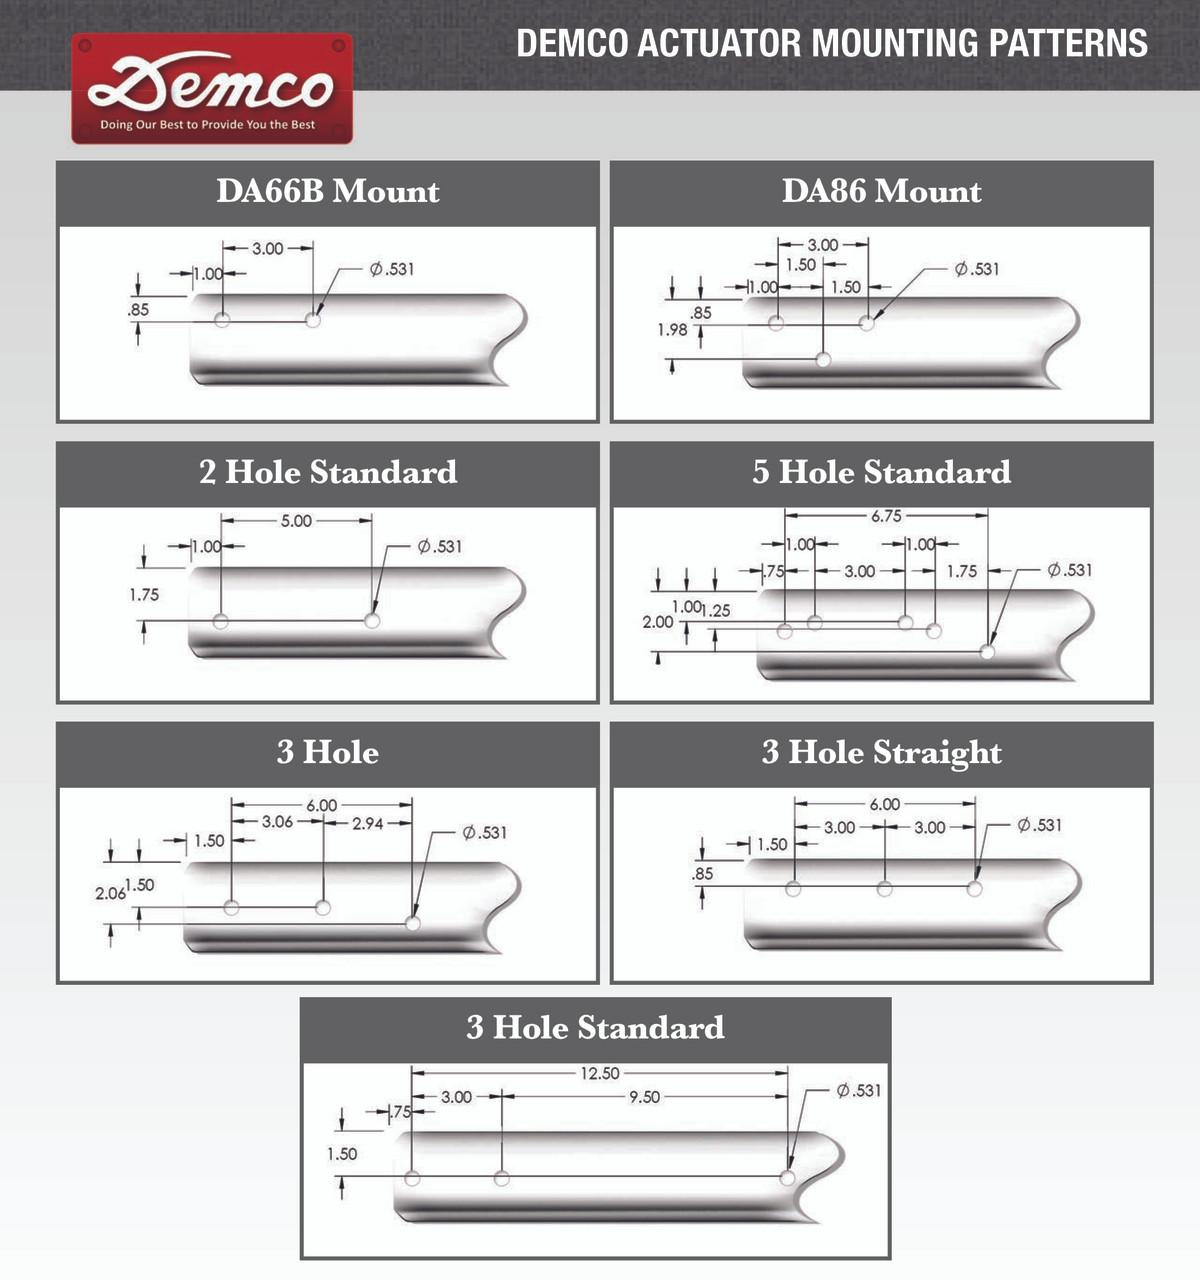 8759153 --- Demco Hydraulic Brake Actuator with Flat Plate - 8,000 lb Capacity - Model DA91